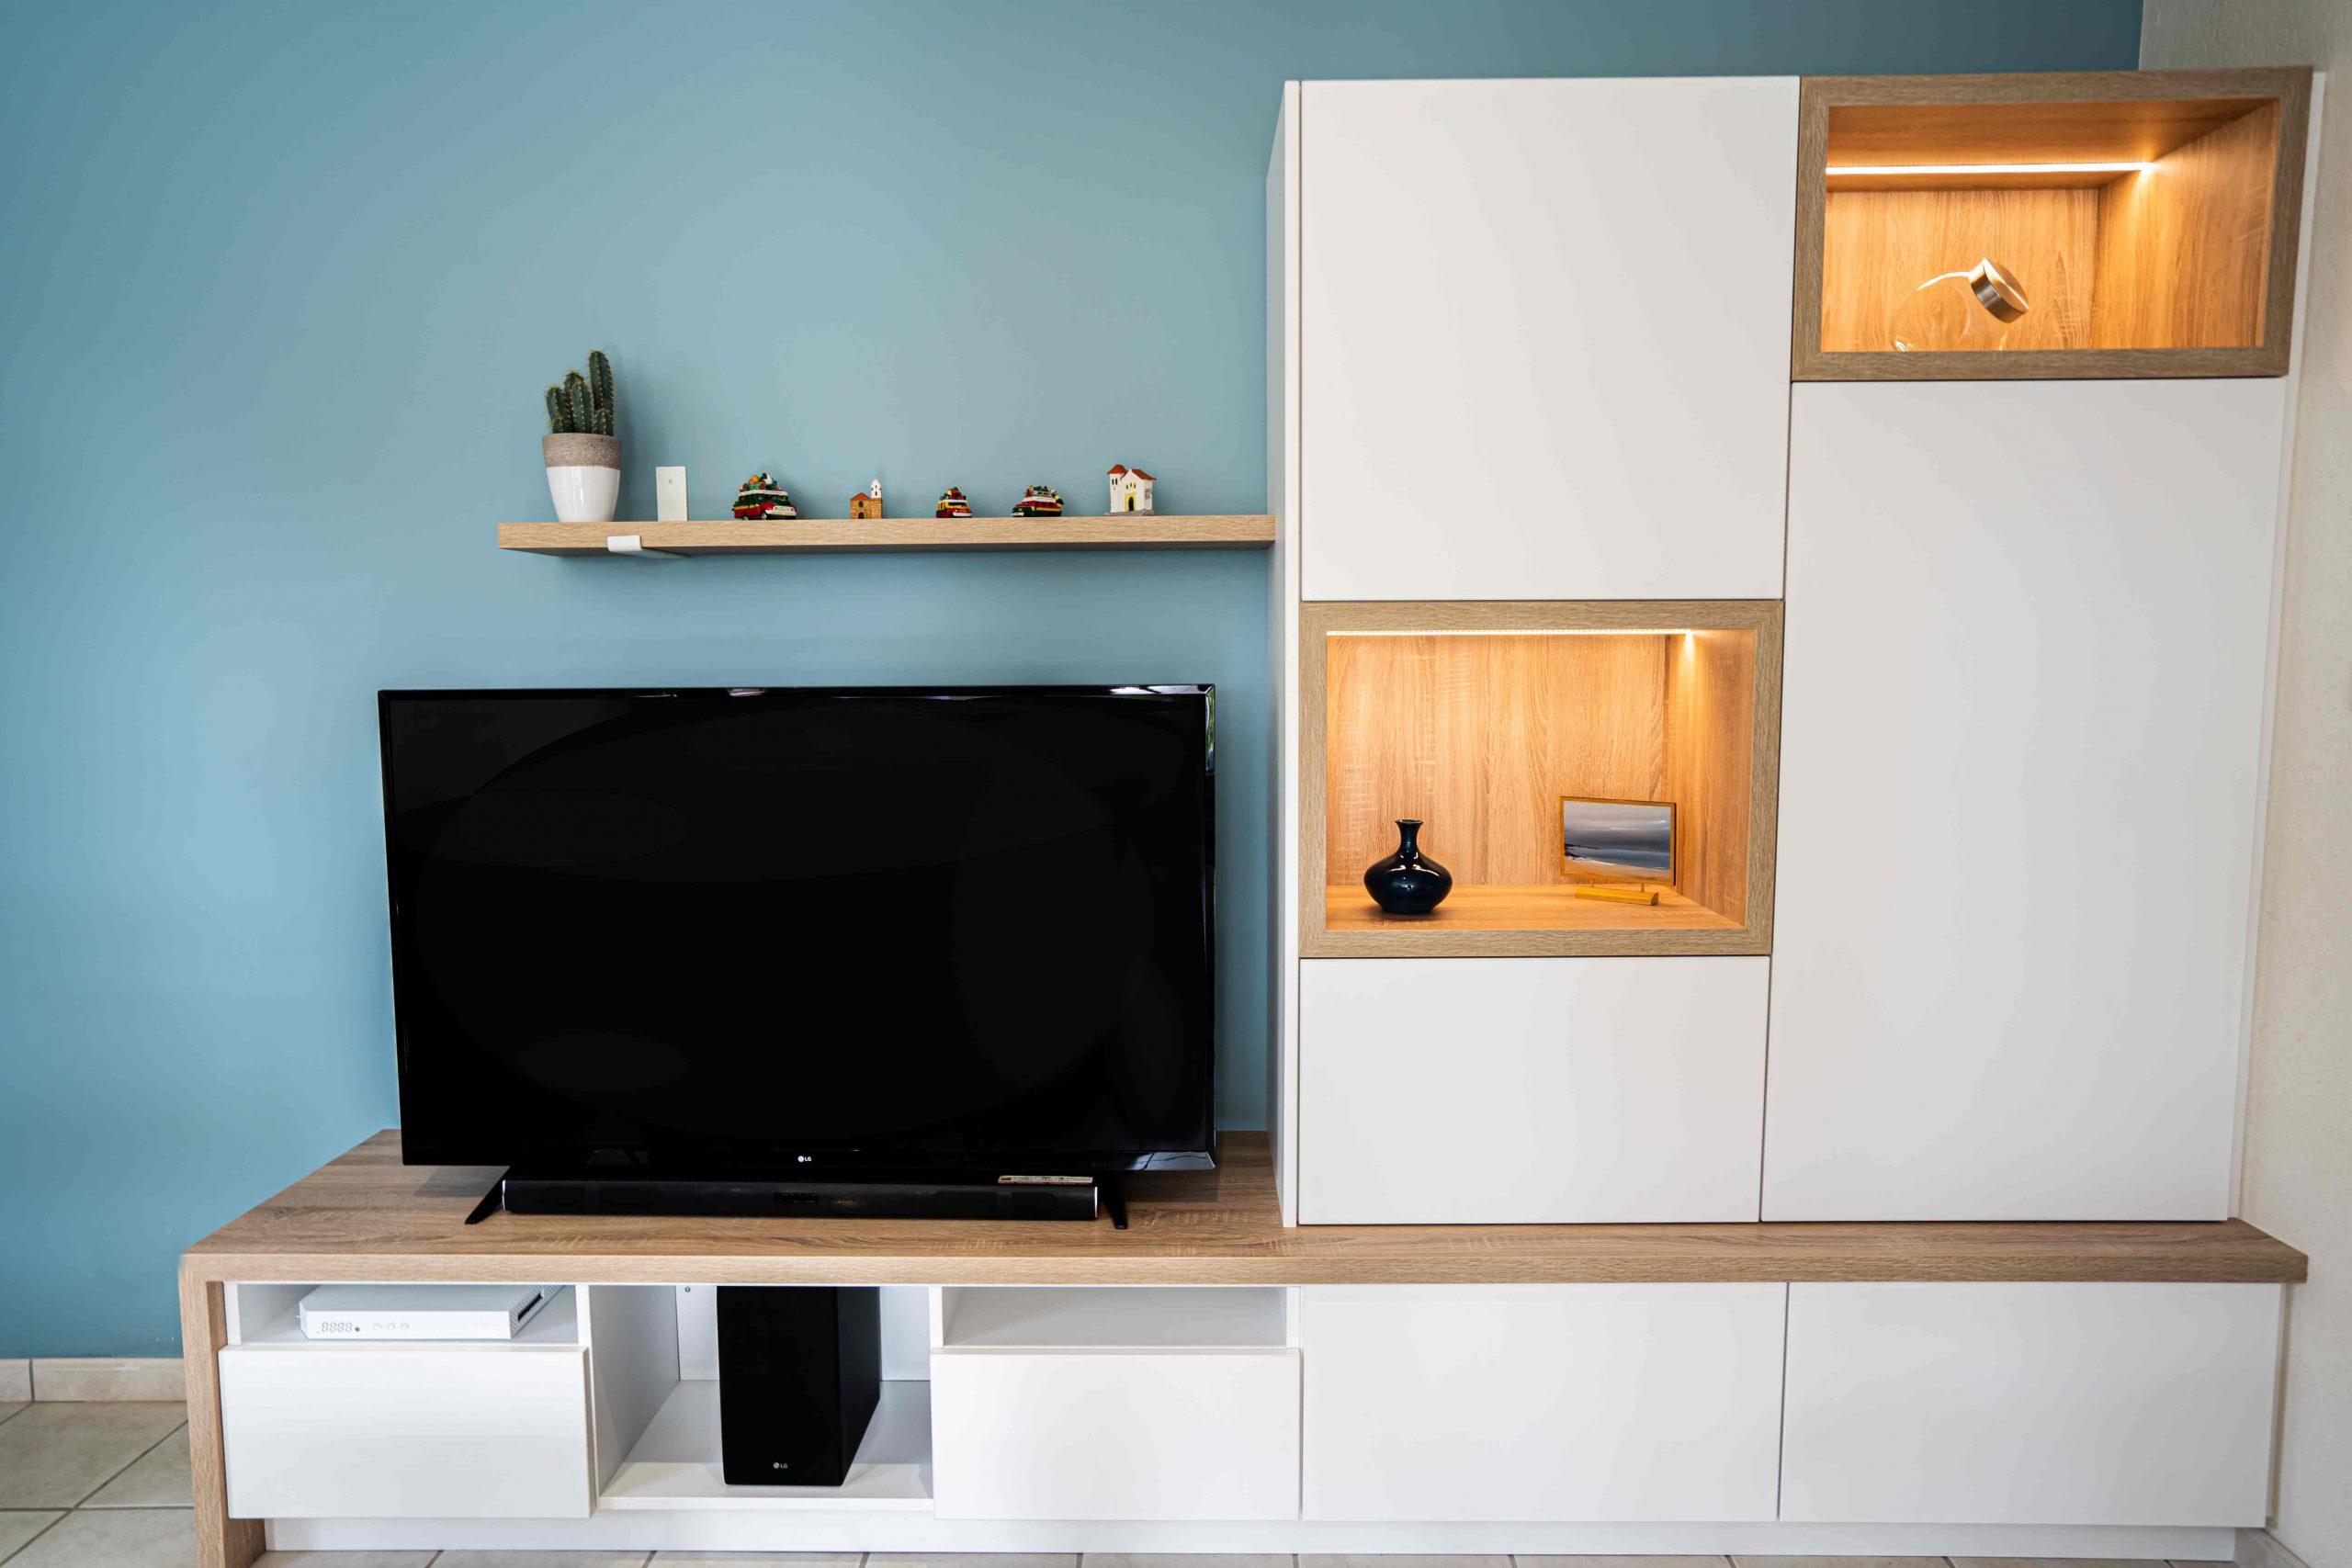 RDI01374 scaled - Meuble TV sur mesure blanc & chêne